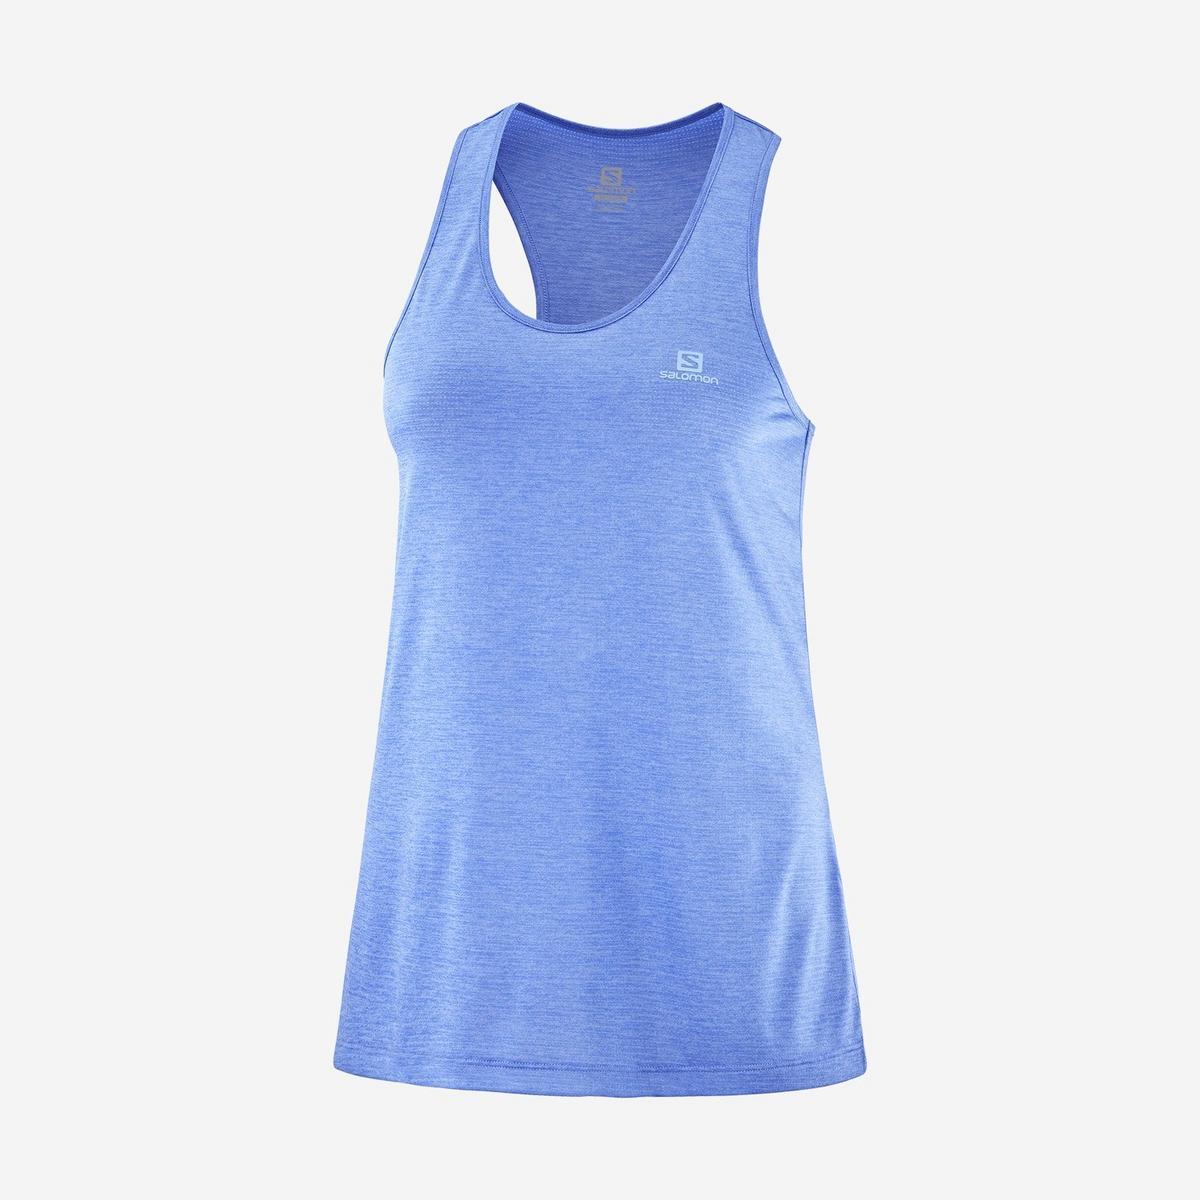 Salomon Women's Agile Tank - Blue